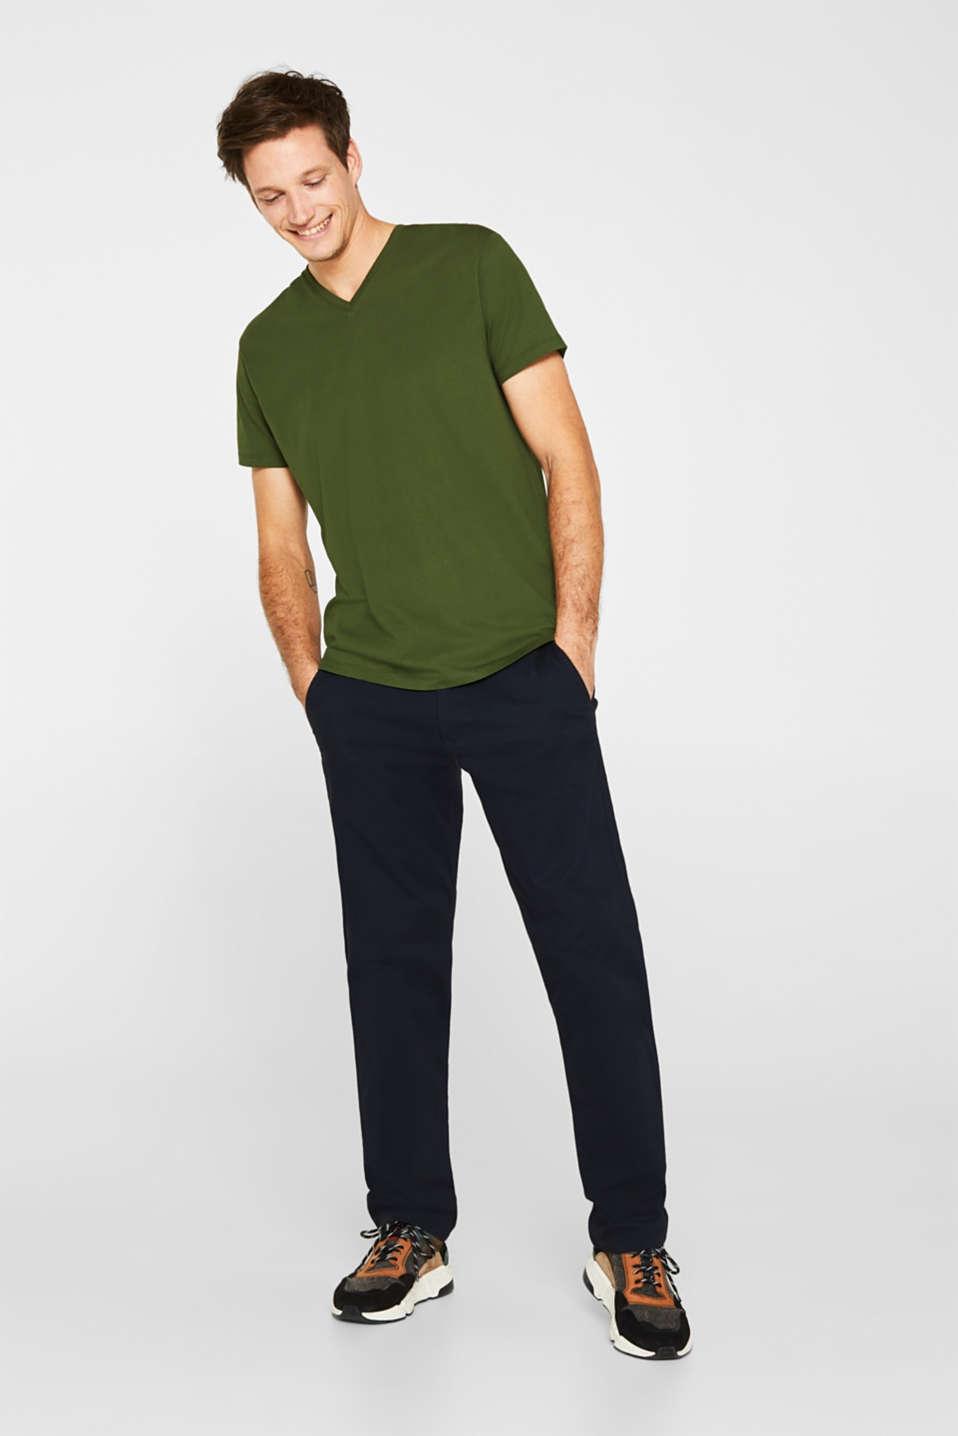 Jersey T-shirt in 100% cotton, KHAKI GREEN, detail image number 4